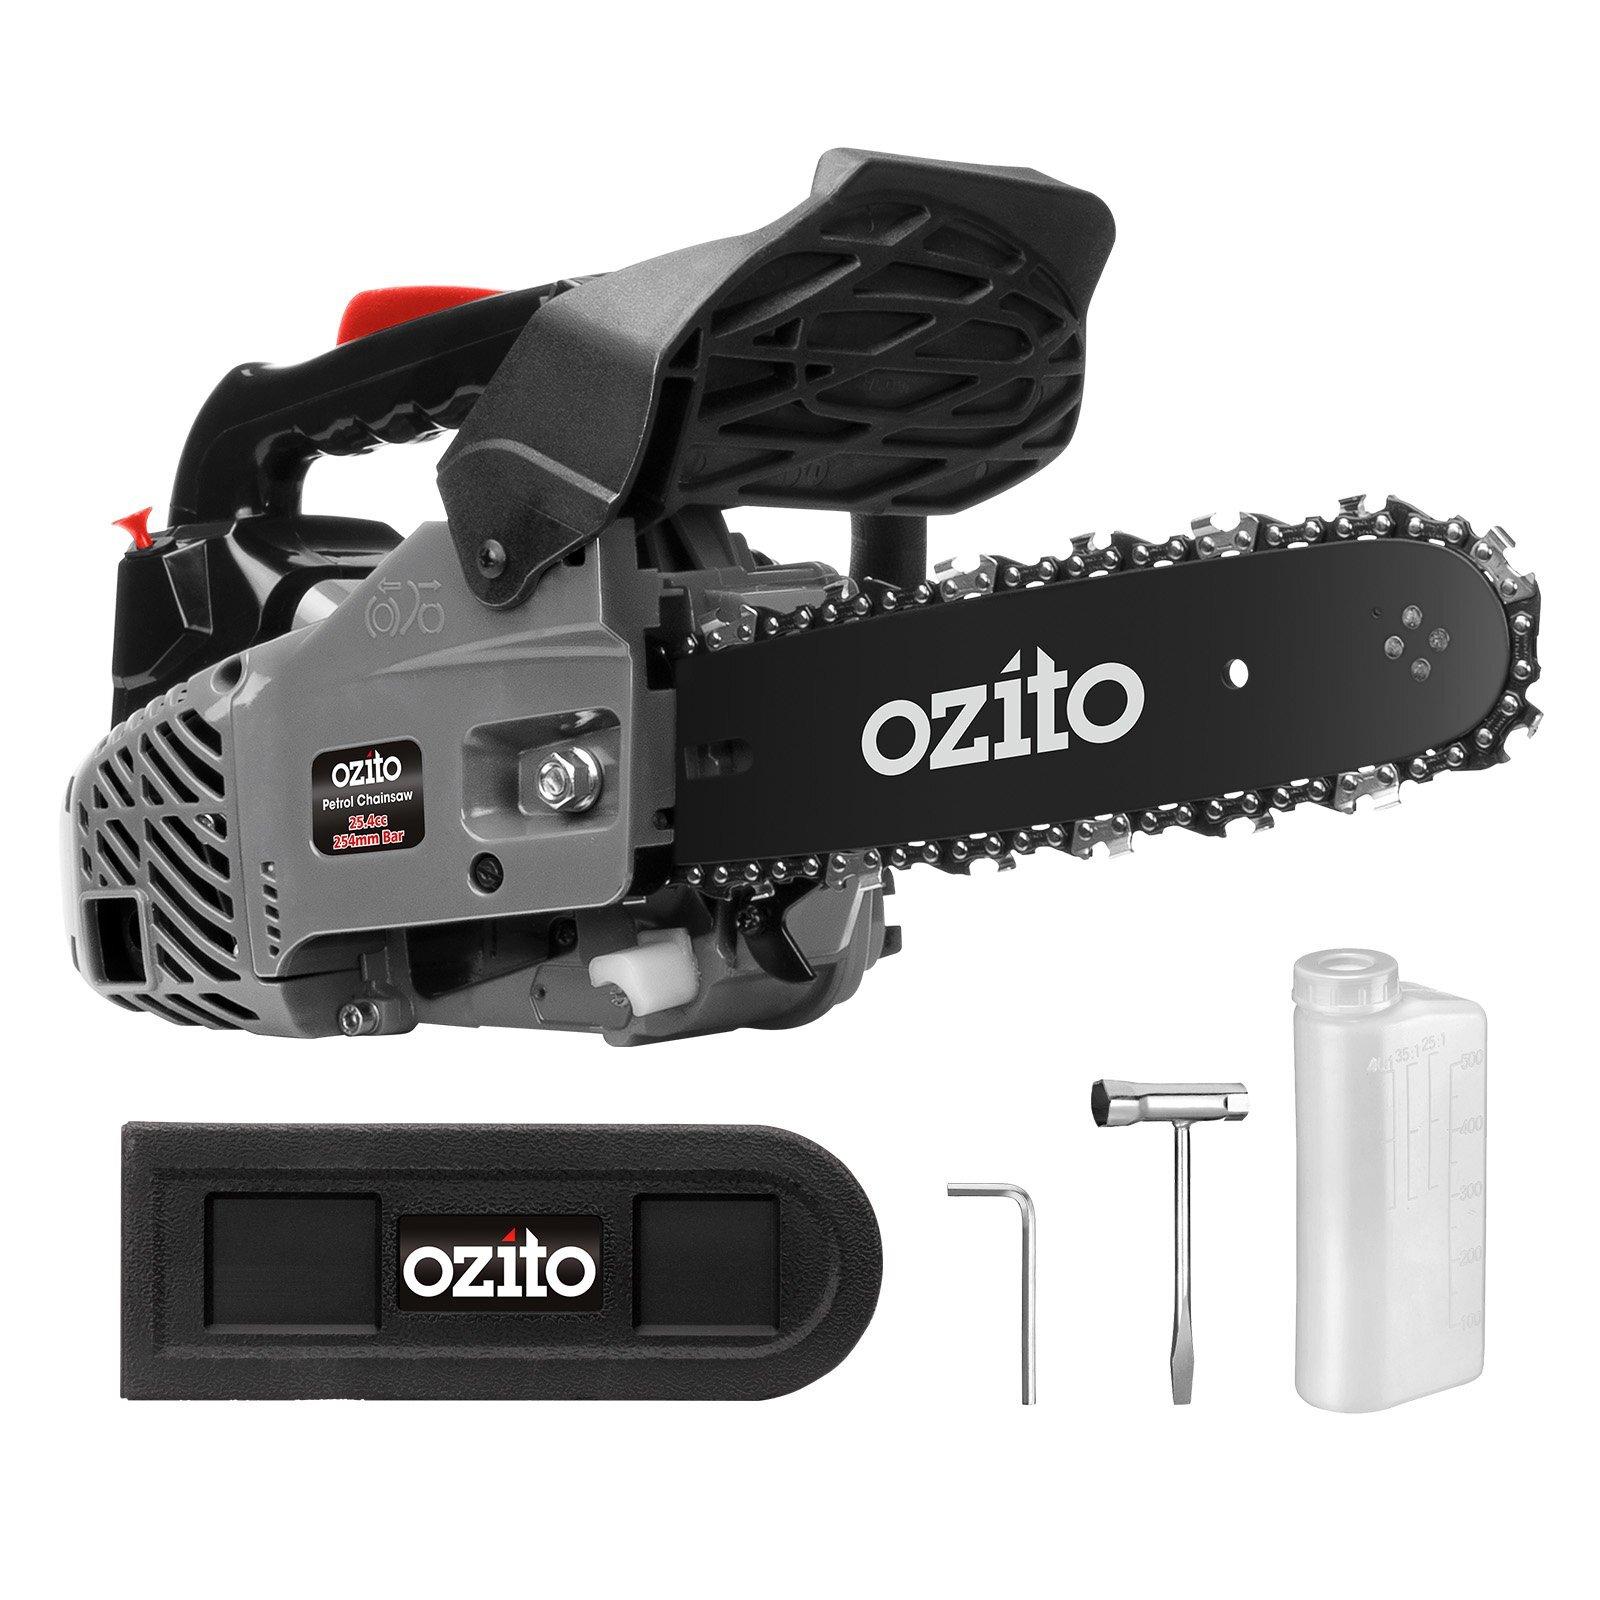 Ozito 25.4cc 254mm 2 Stroke Petrol Chainsaw